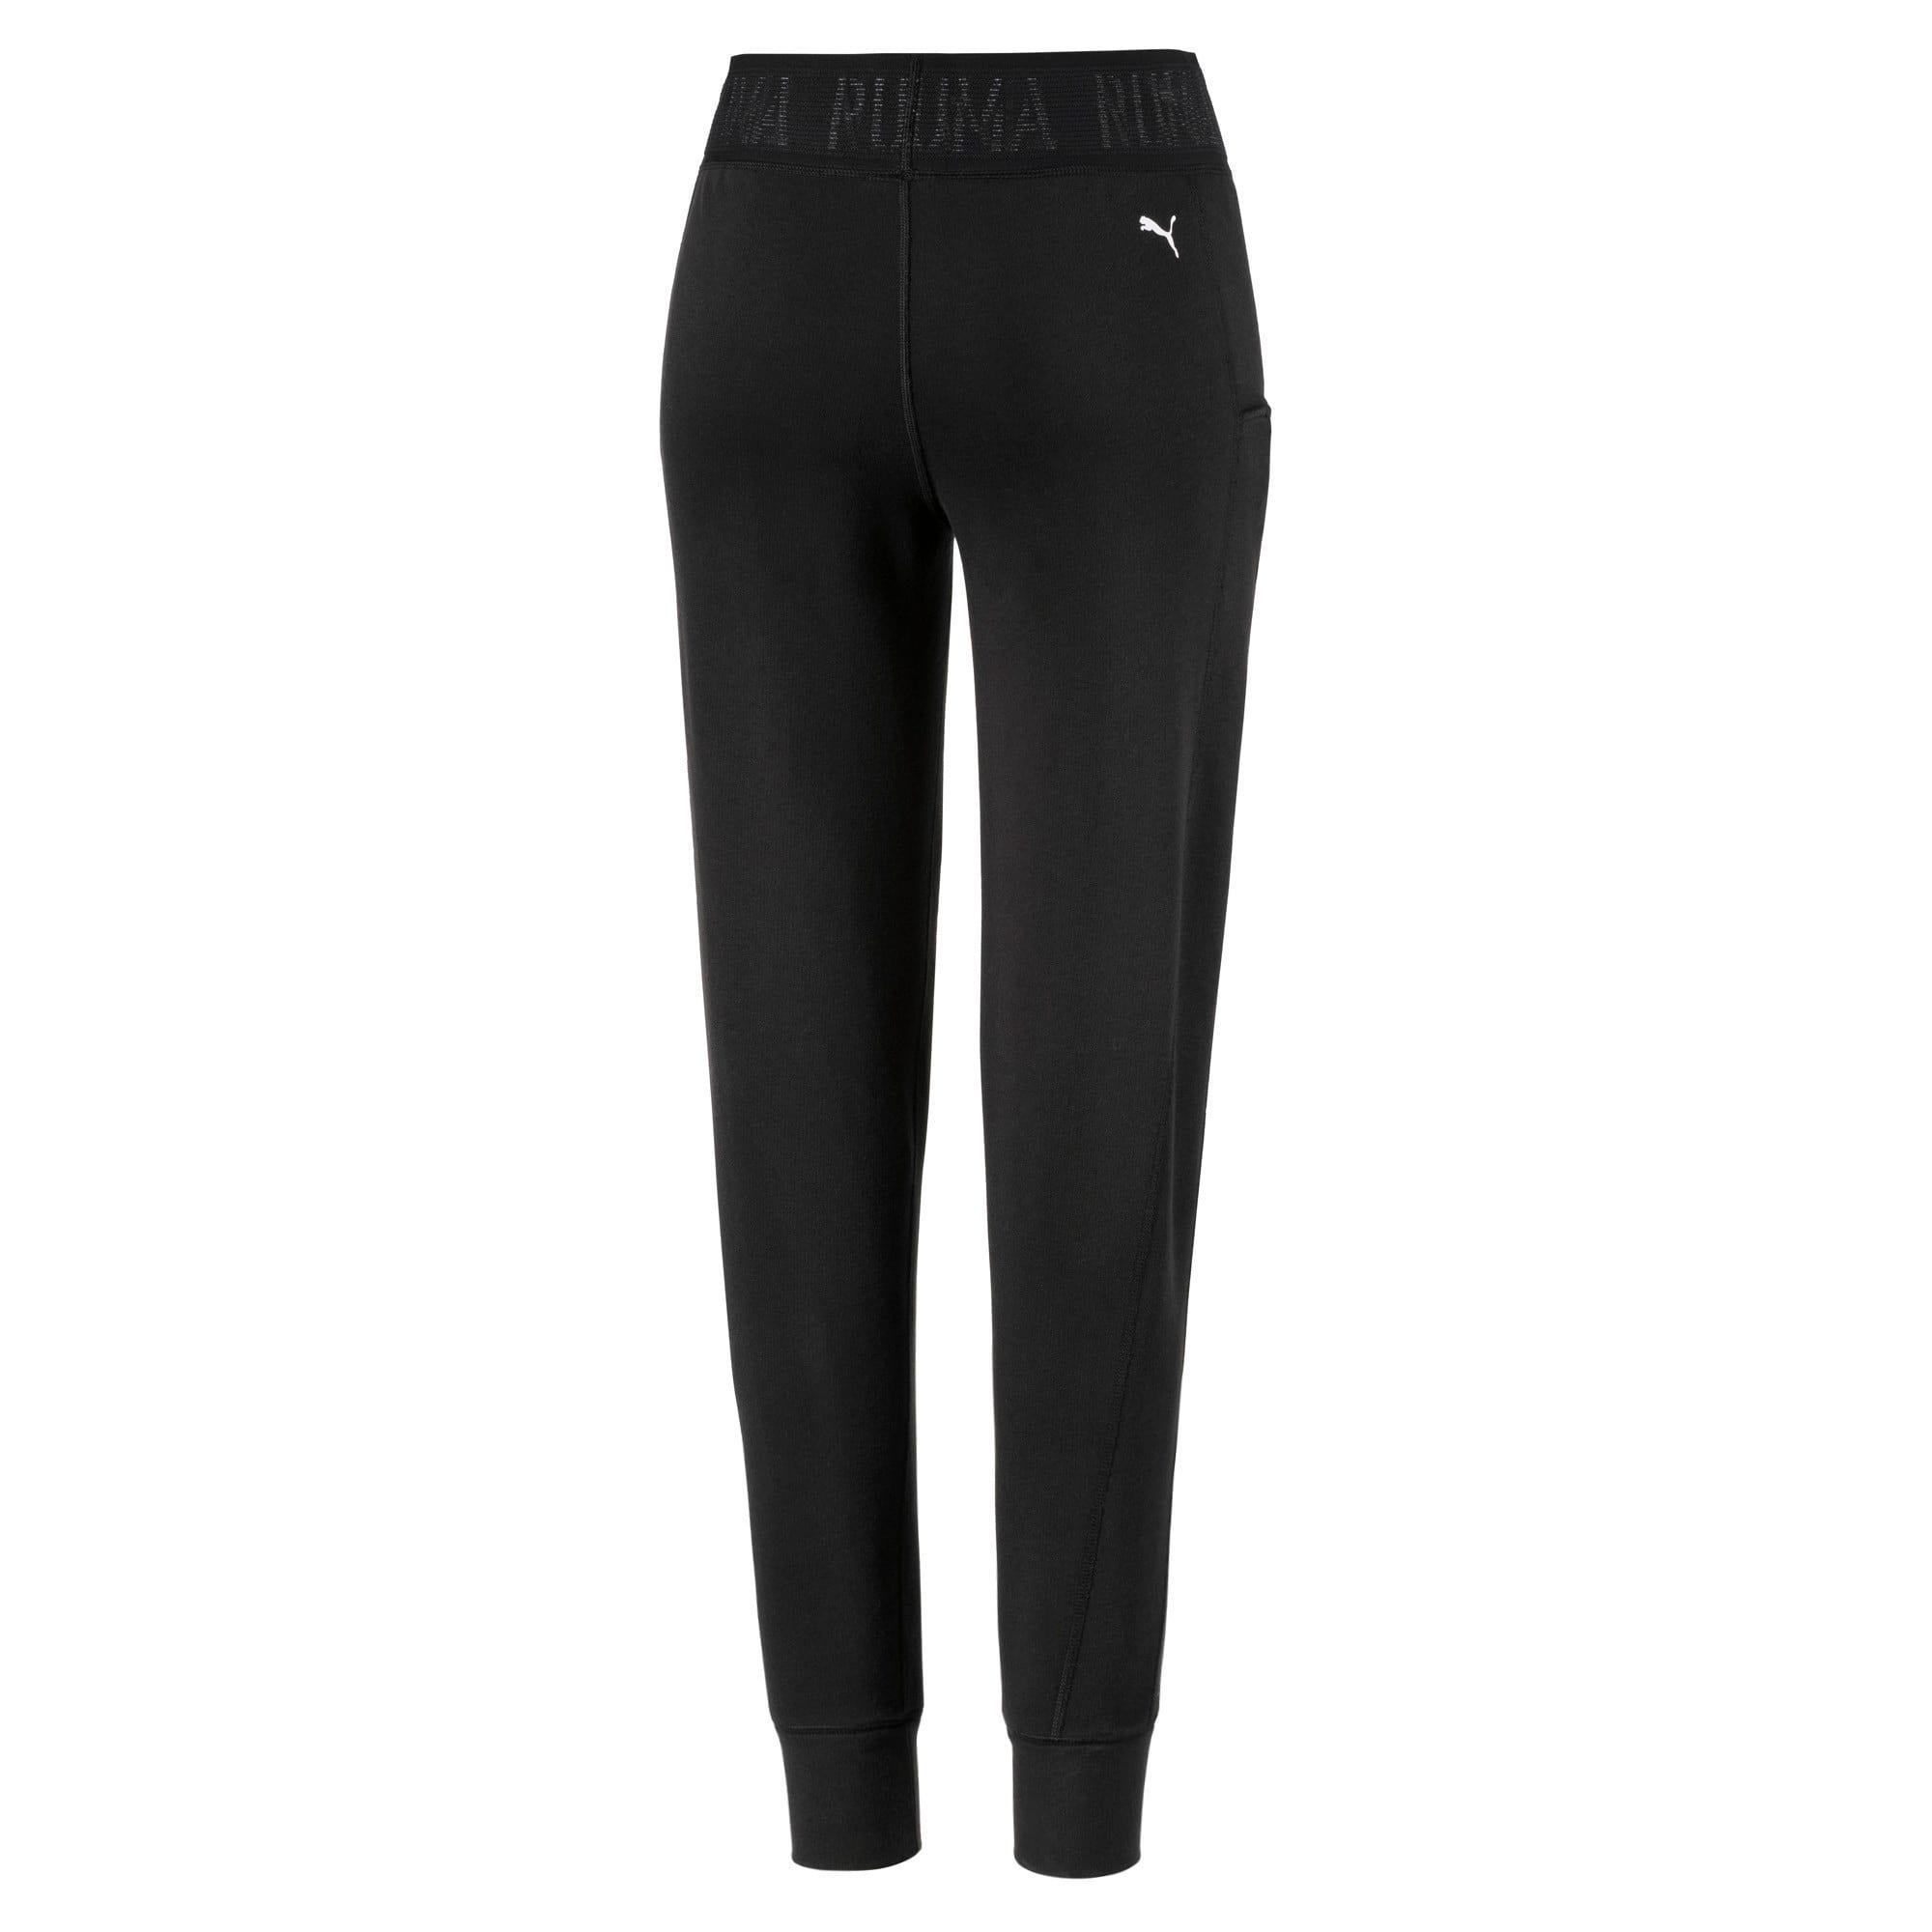 Thumbnail 5 of Logo Women's Sweatpants, Puma Black-Q3, medium